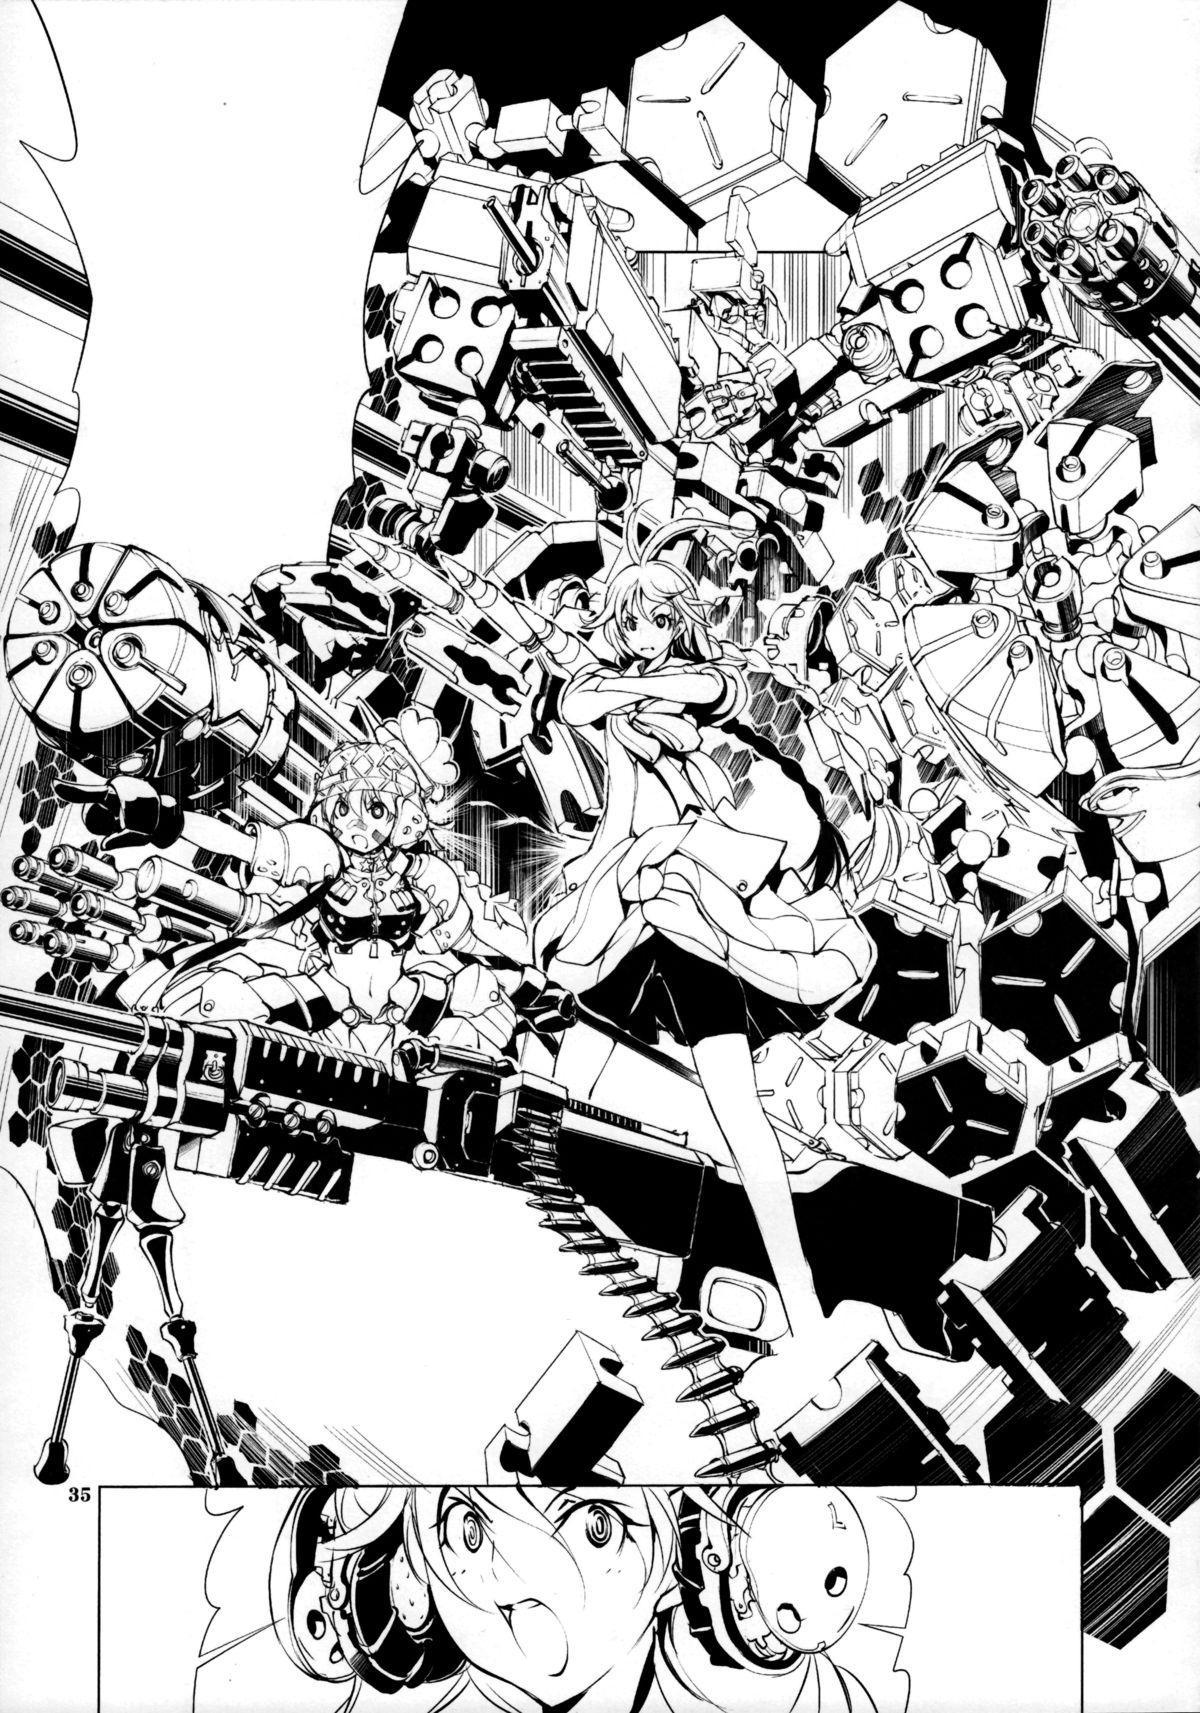 (C89) [Algolagnia (Mikoshiro Honnin)] Naruto [saga] sei (NARUTO) 34